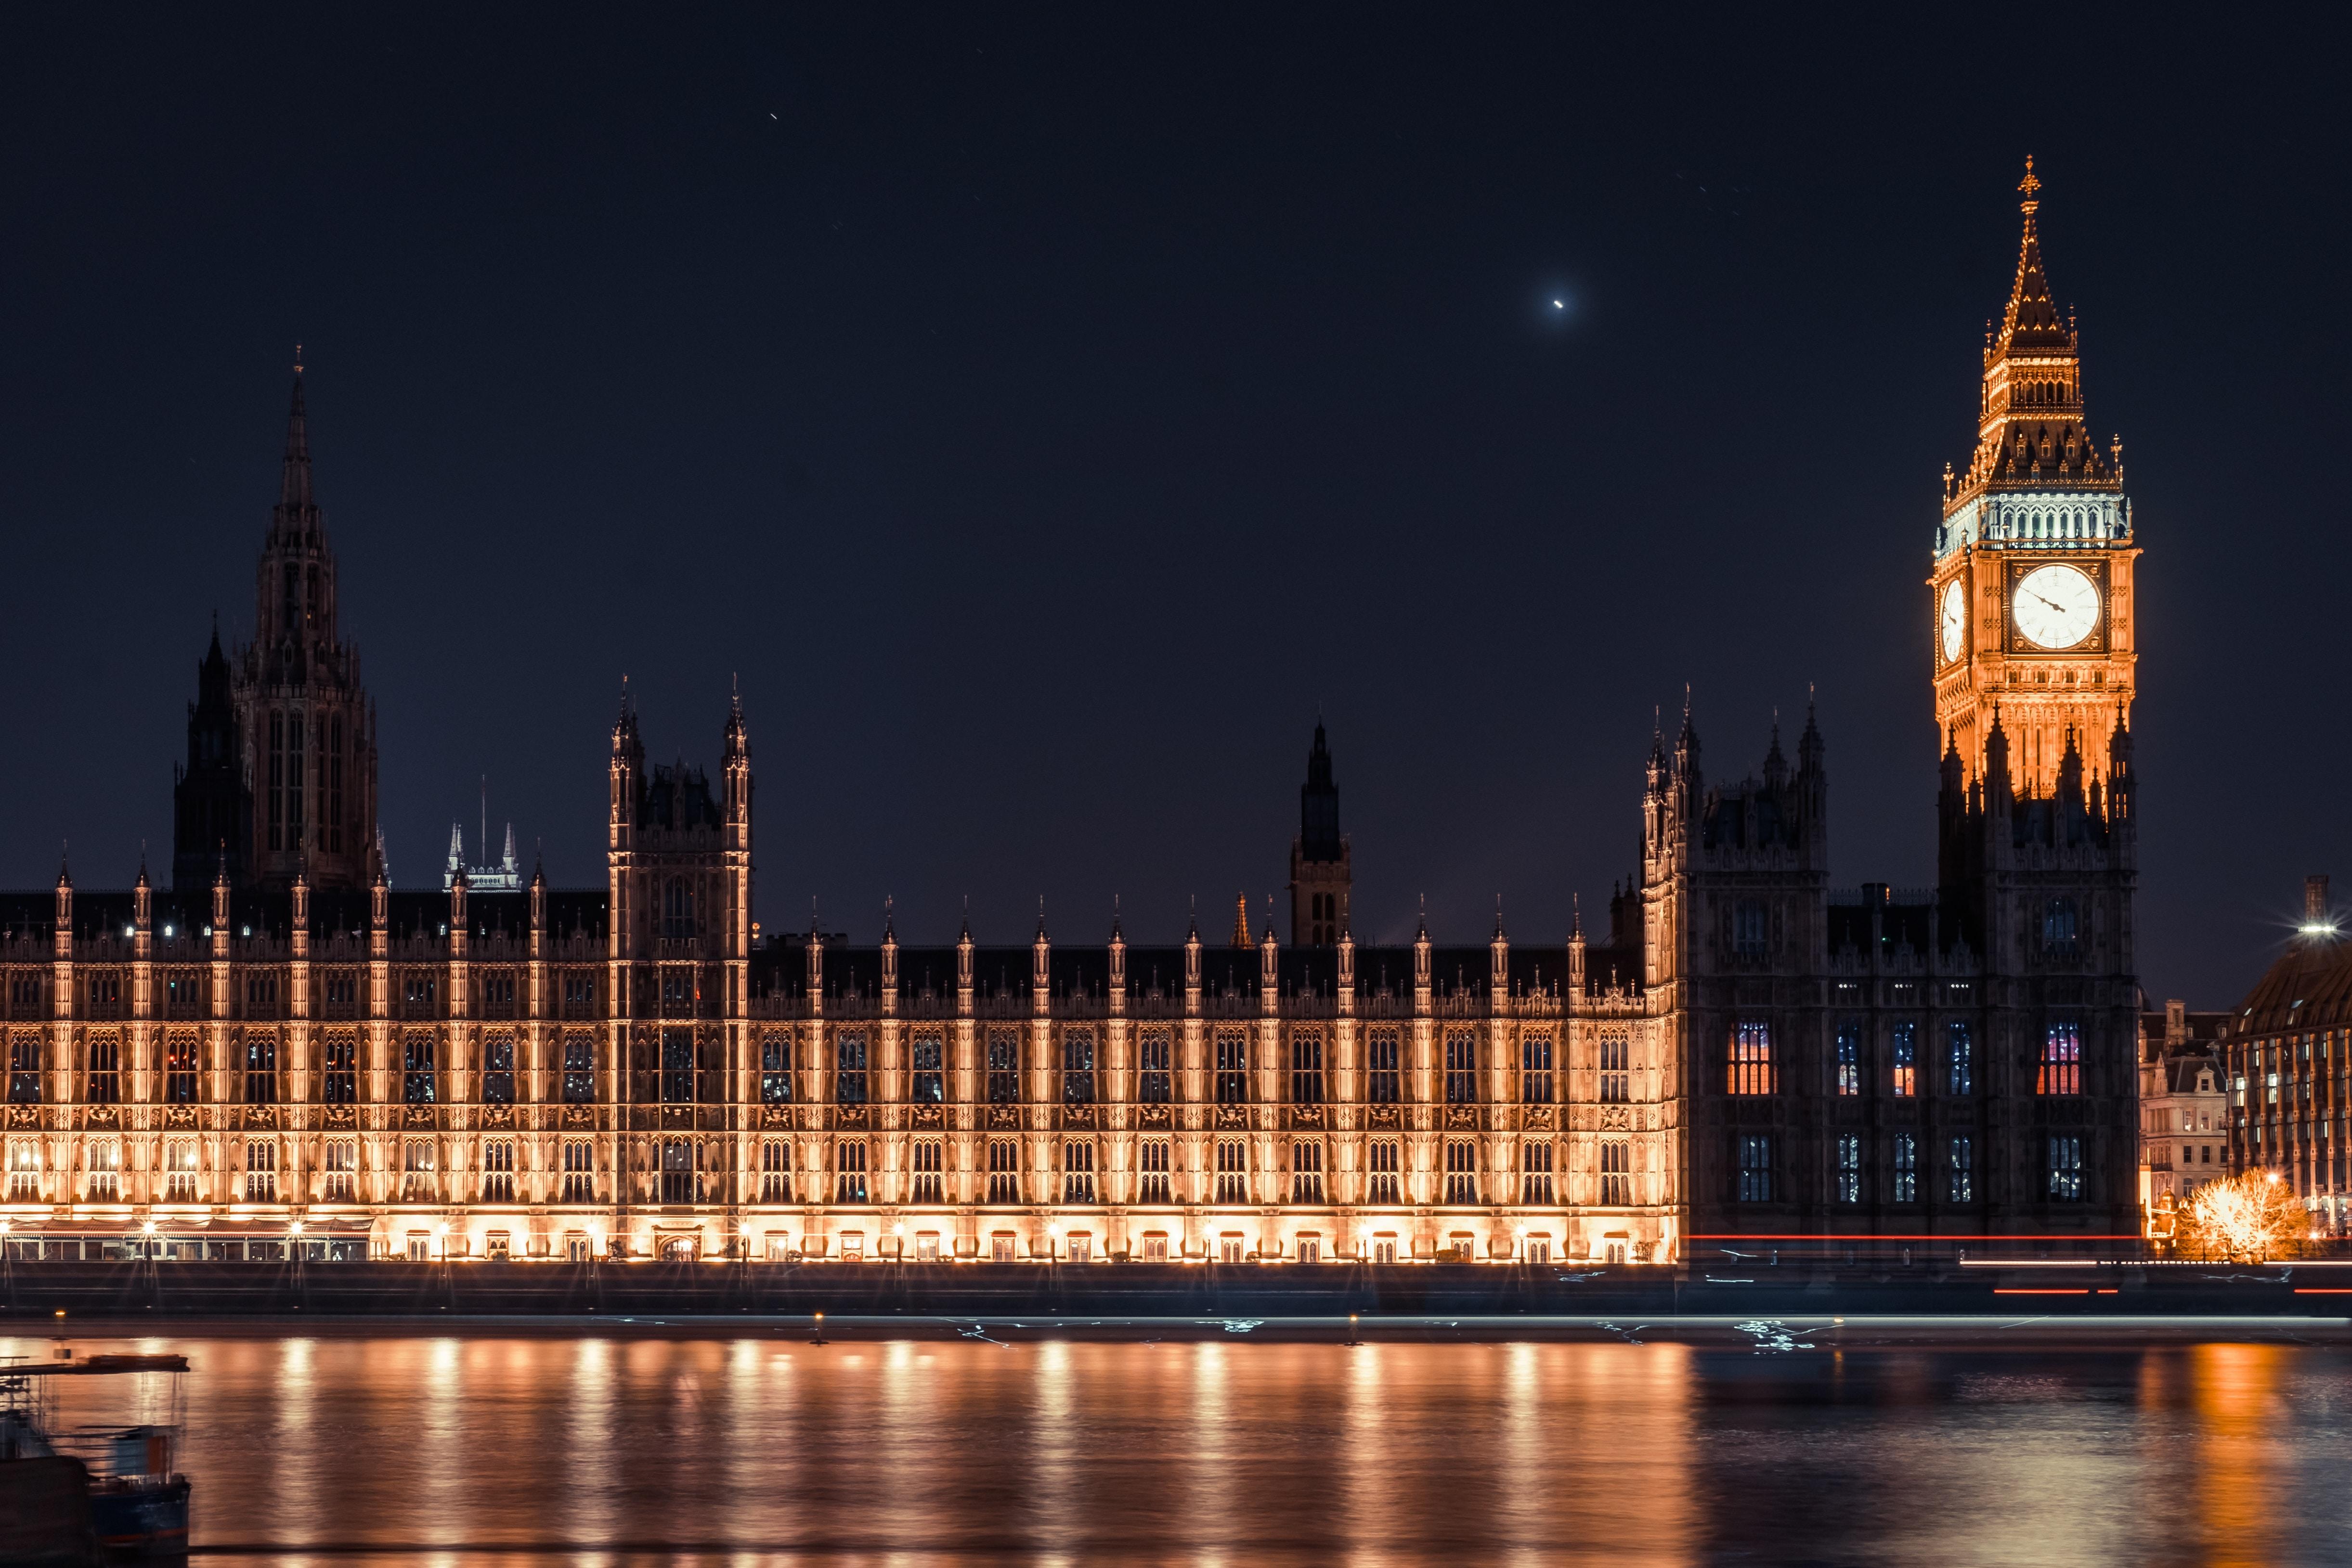 view of Big Ben, London